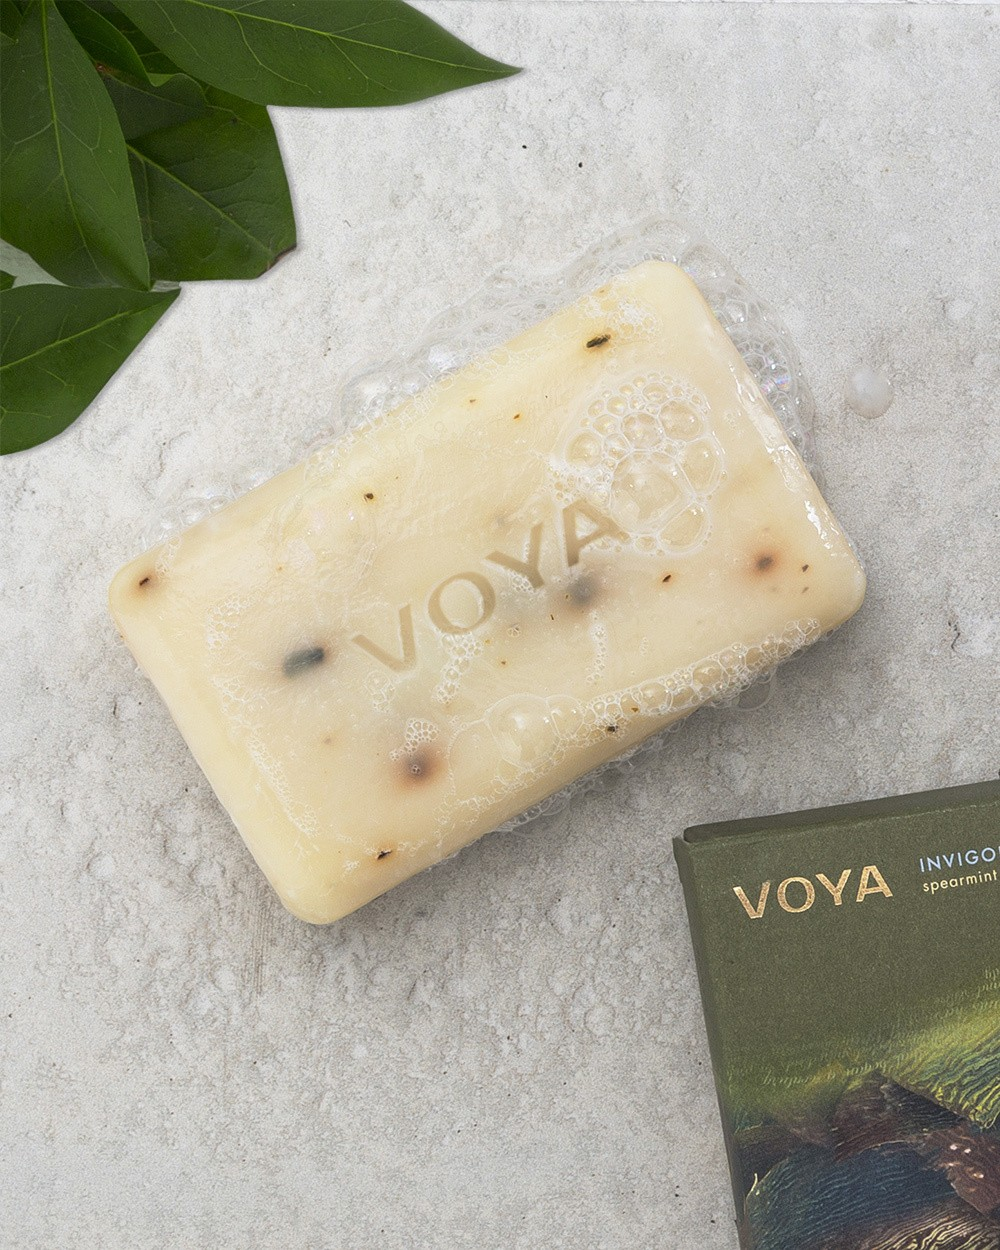 Voya Seaweed Soap - Spearmint & Rosemary